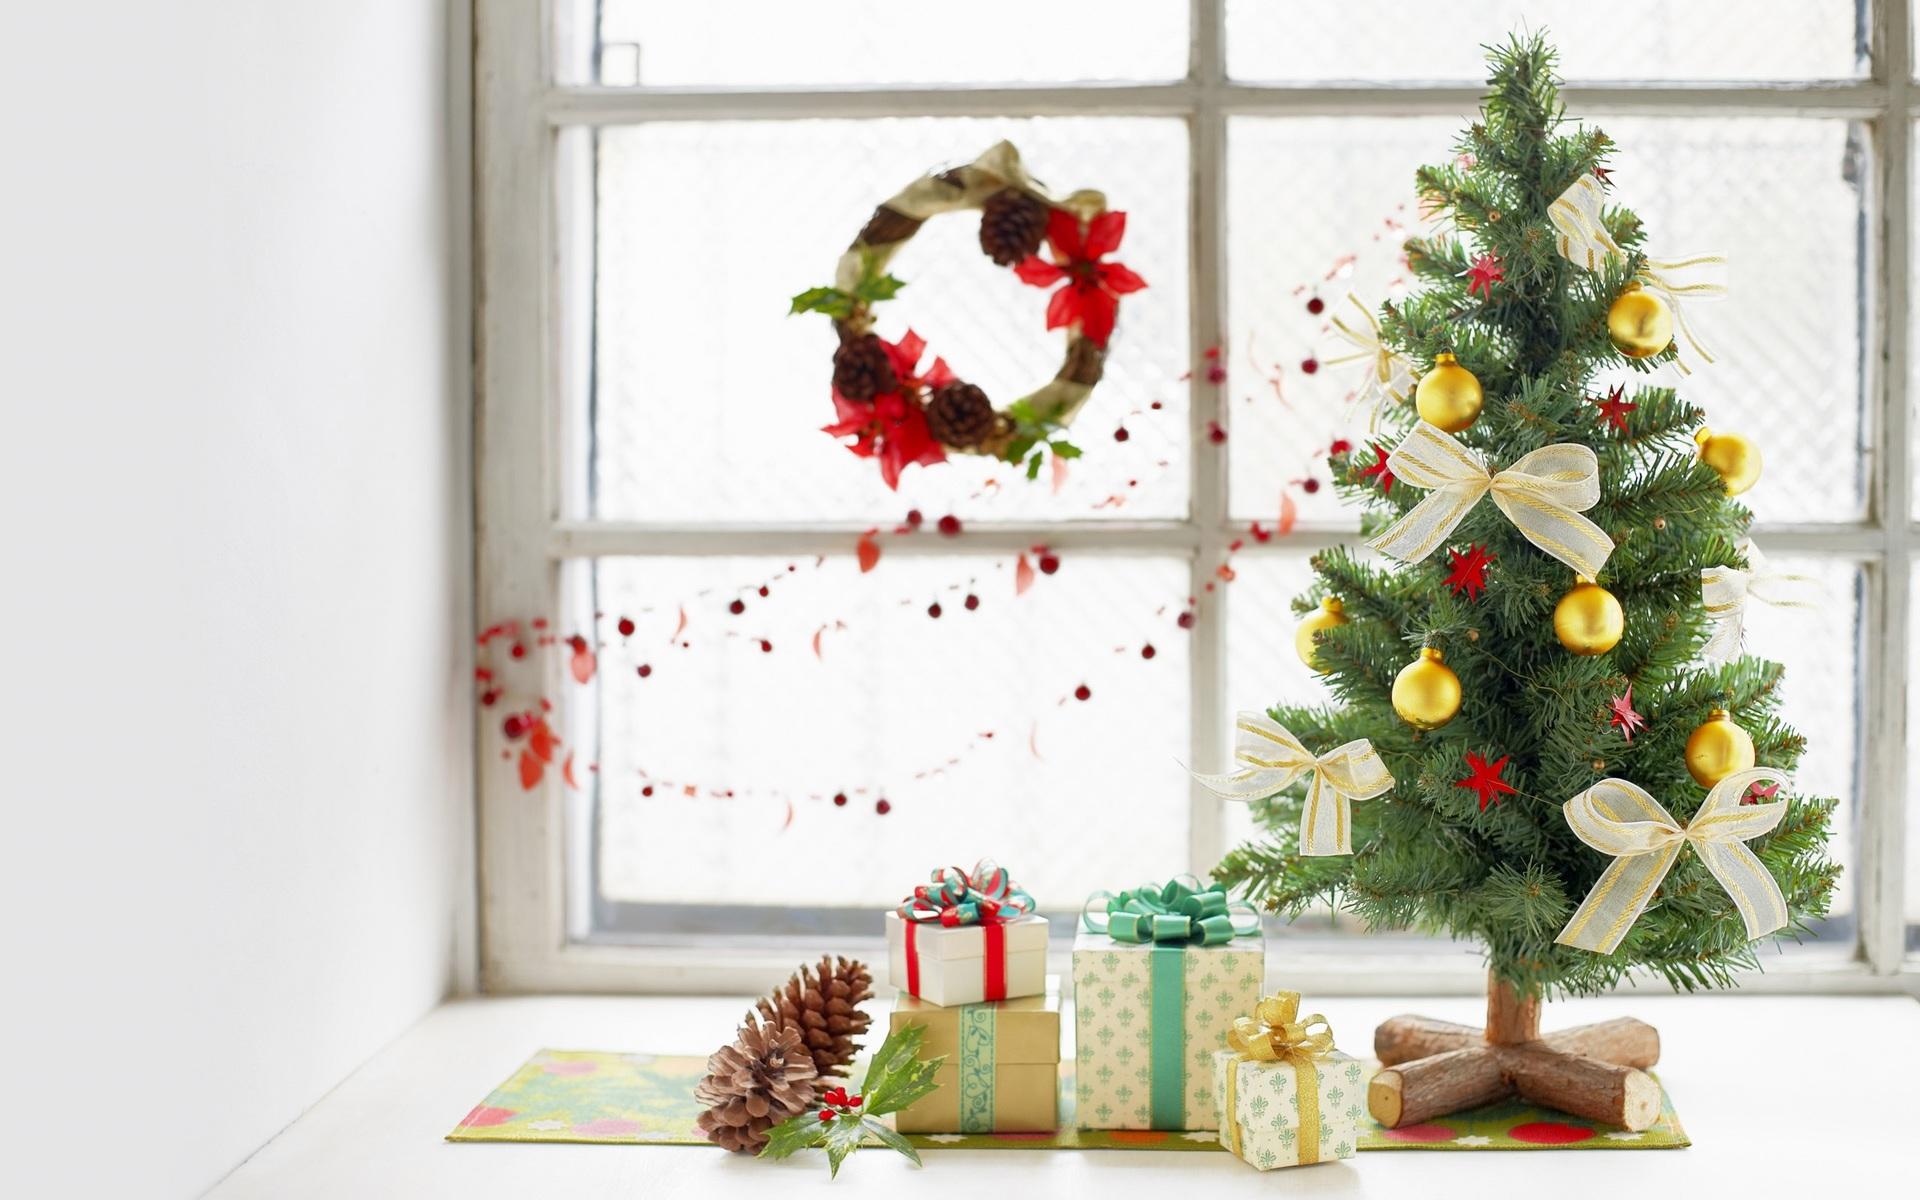 Подарки под ёлкой фото